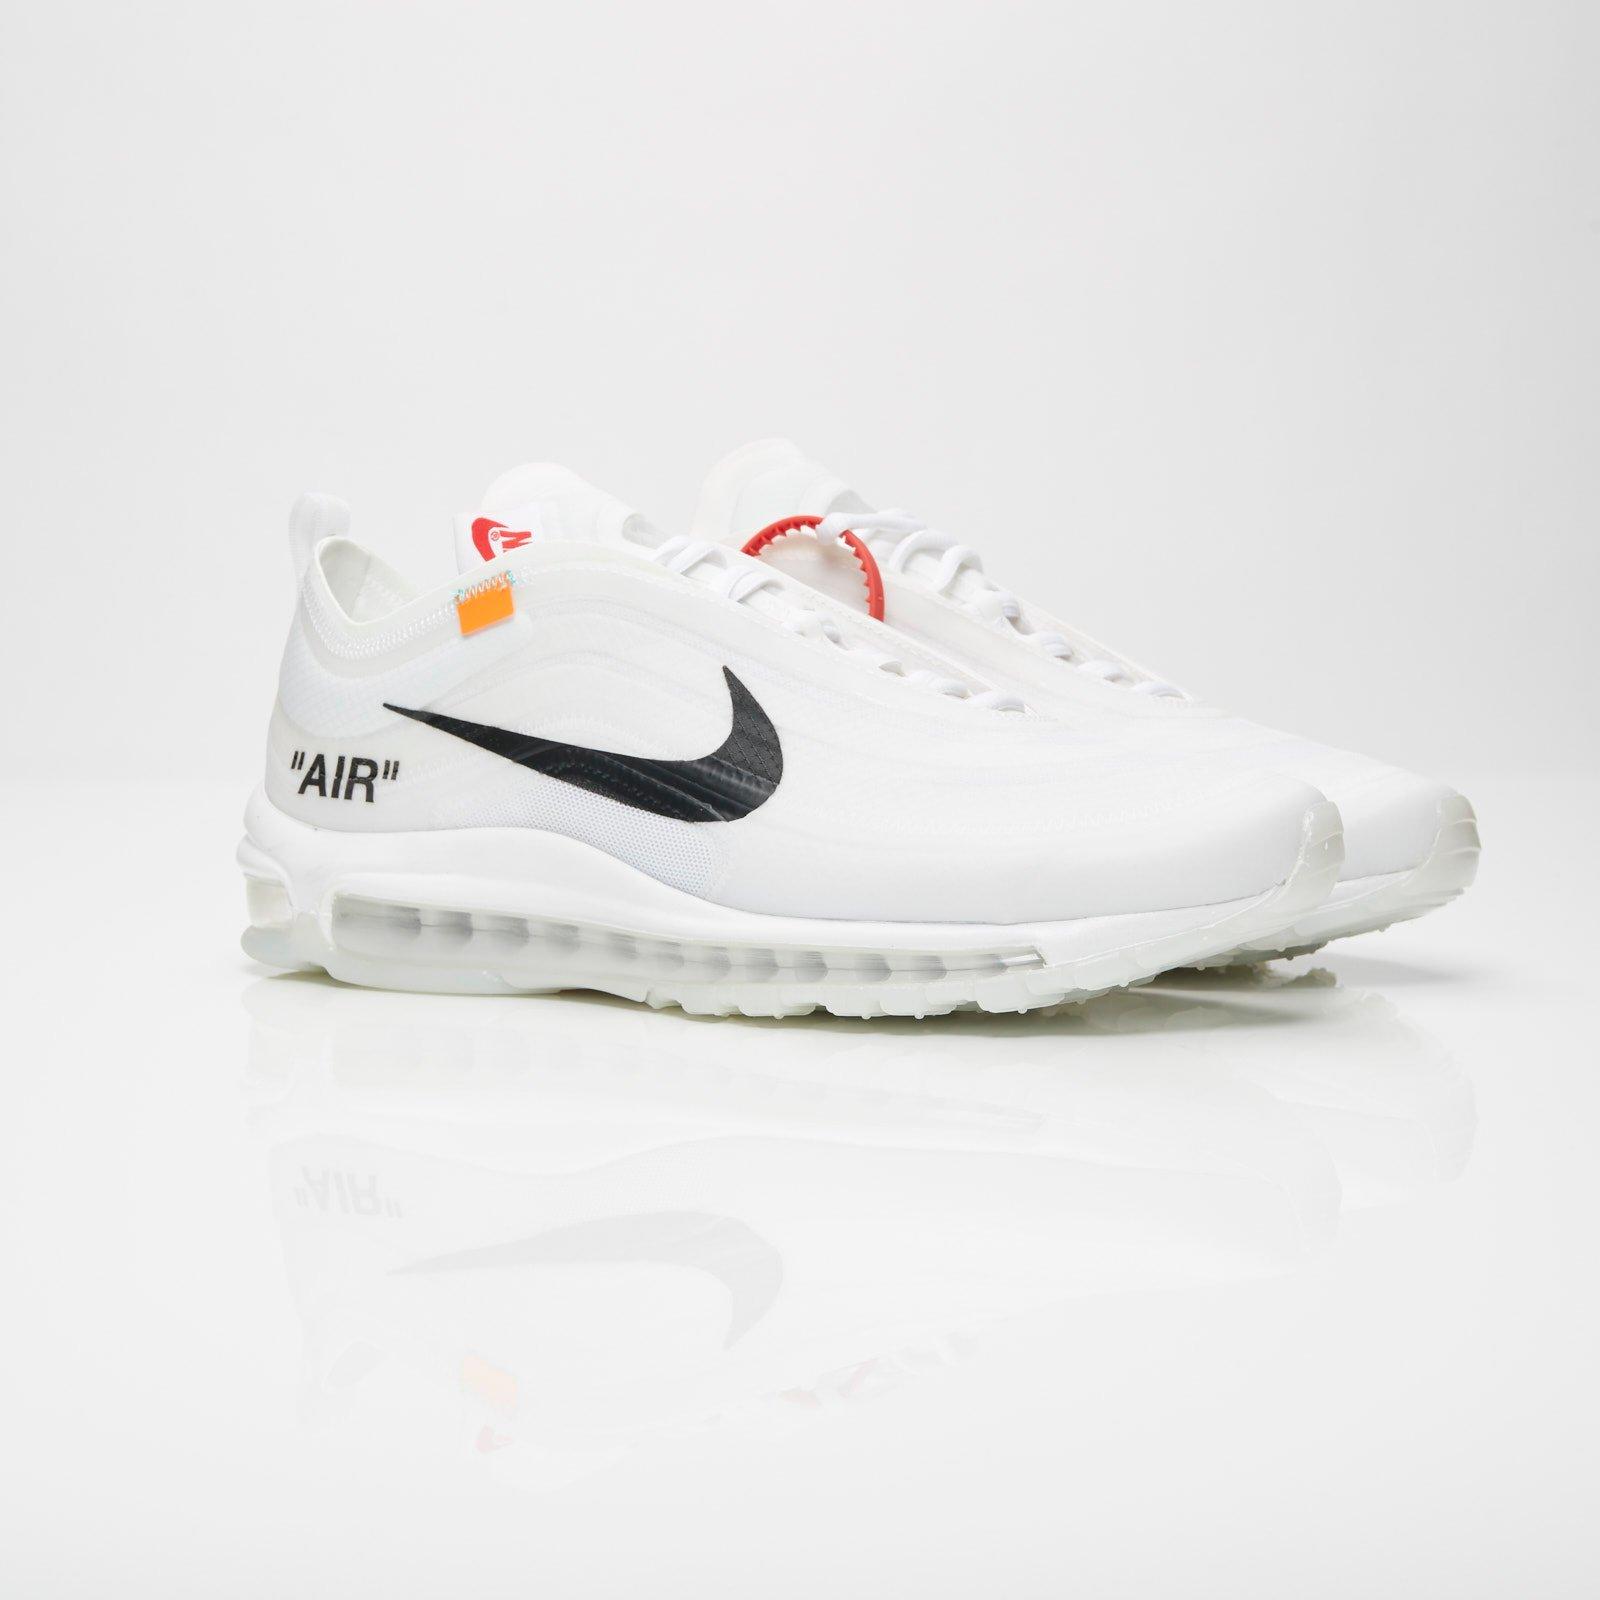 e536033771722 Nike The 10  Air Max 97 OG - Aj4585-100 - Sneakersnstuff